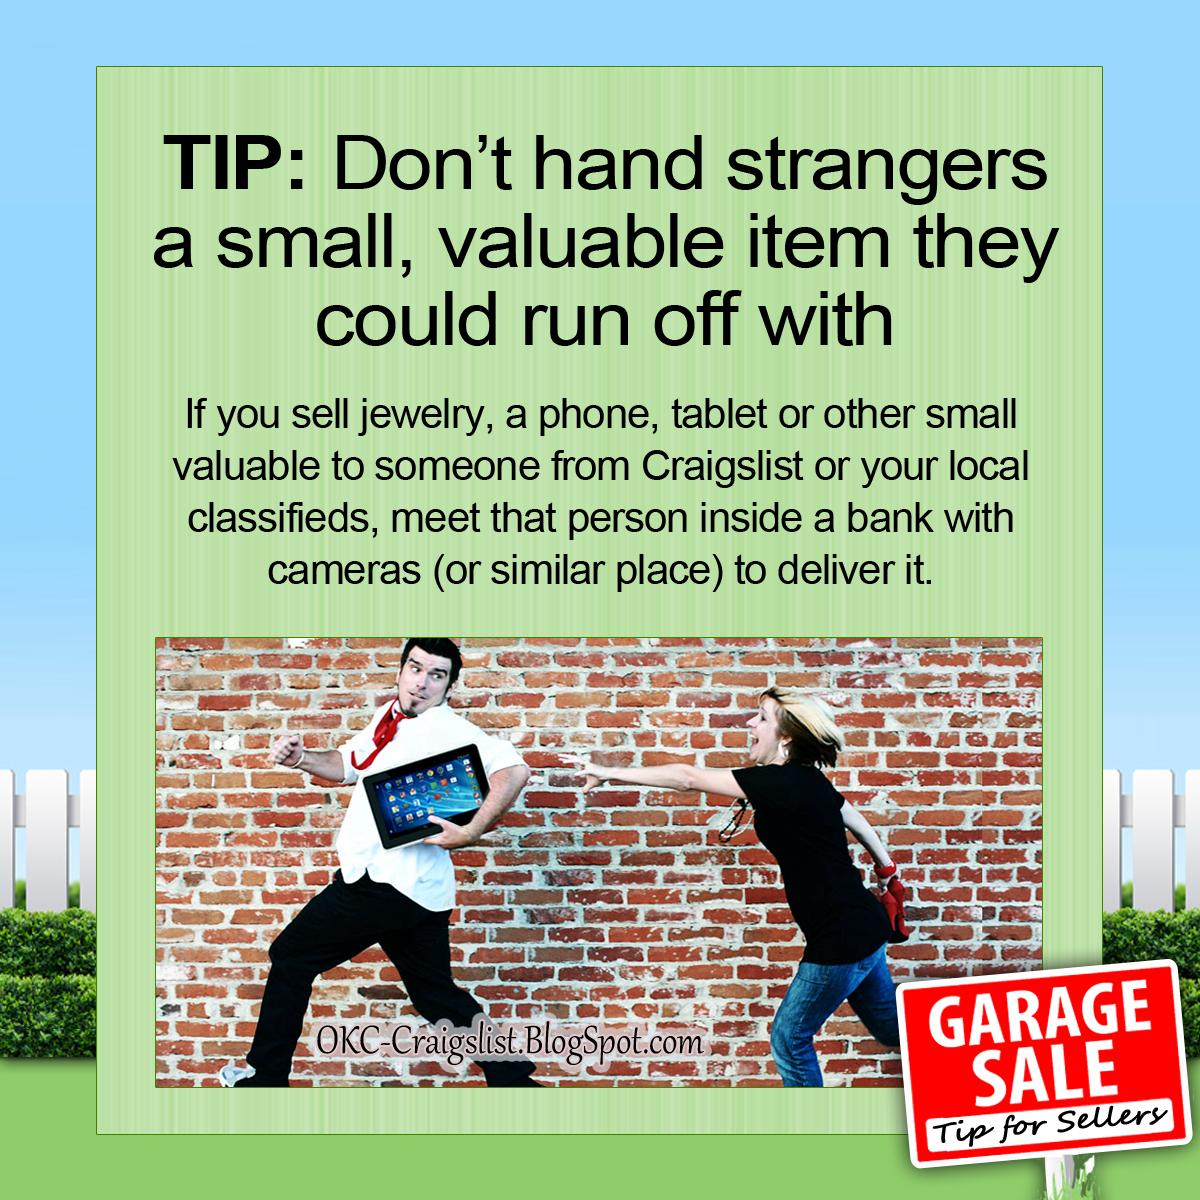 CRAIGSLIST TIP: Stop a Craigslist Thief in His Tracks | OKC Craigslist Garage Sale